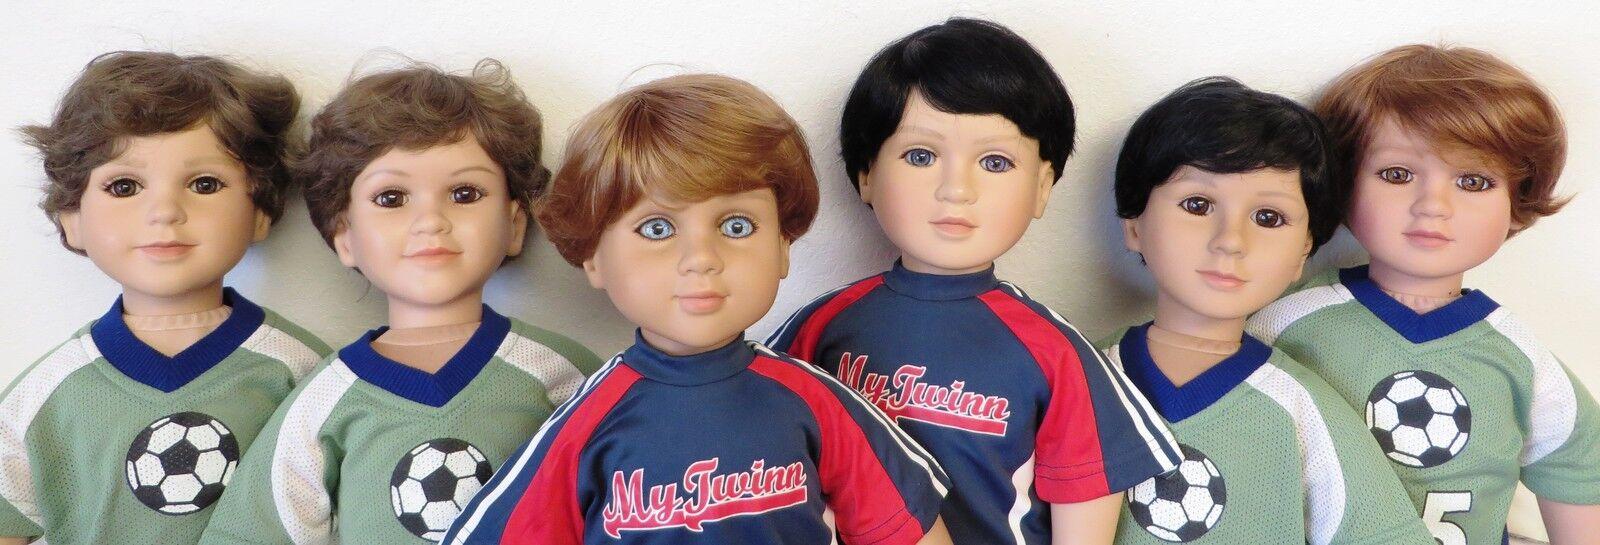 Second Childhood Dolls & Toys